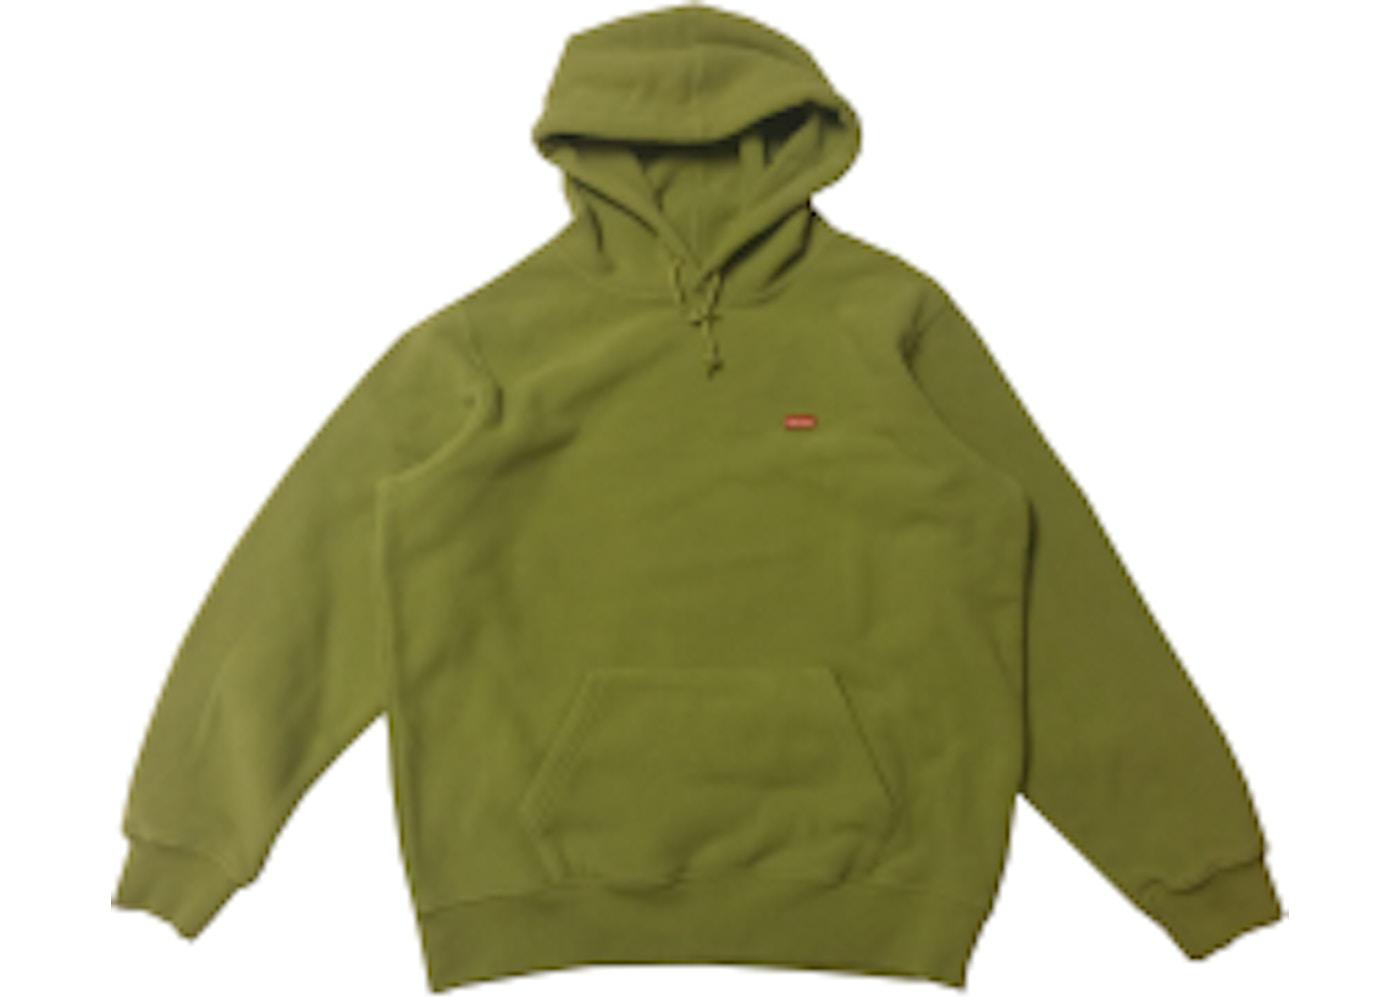 Or Ask Size Xl View All Bids Supreme Polartec Hooded Sweatshirt Sulphur